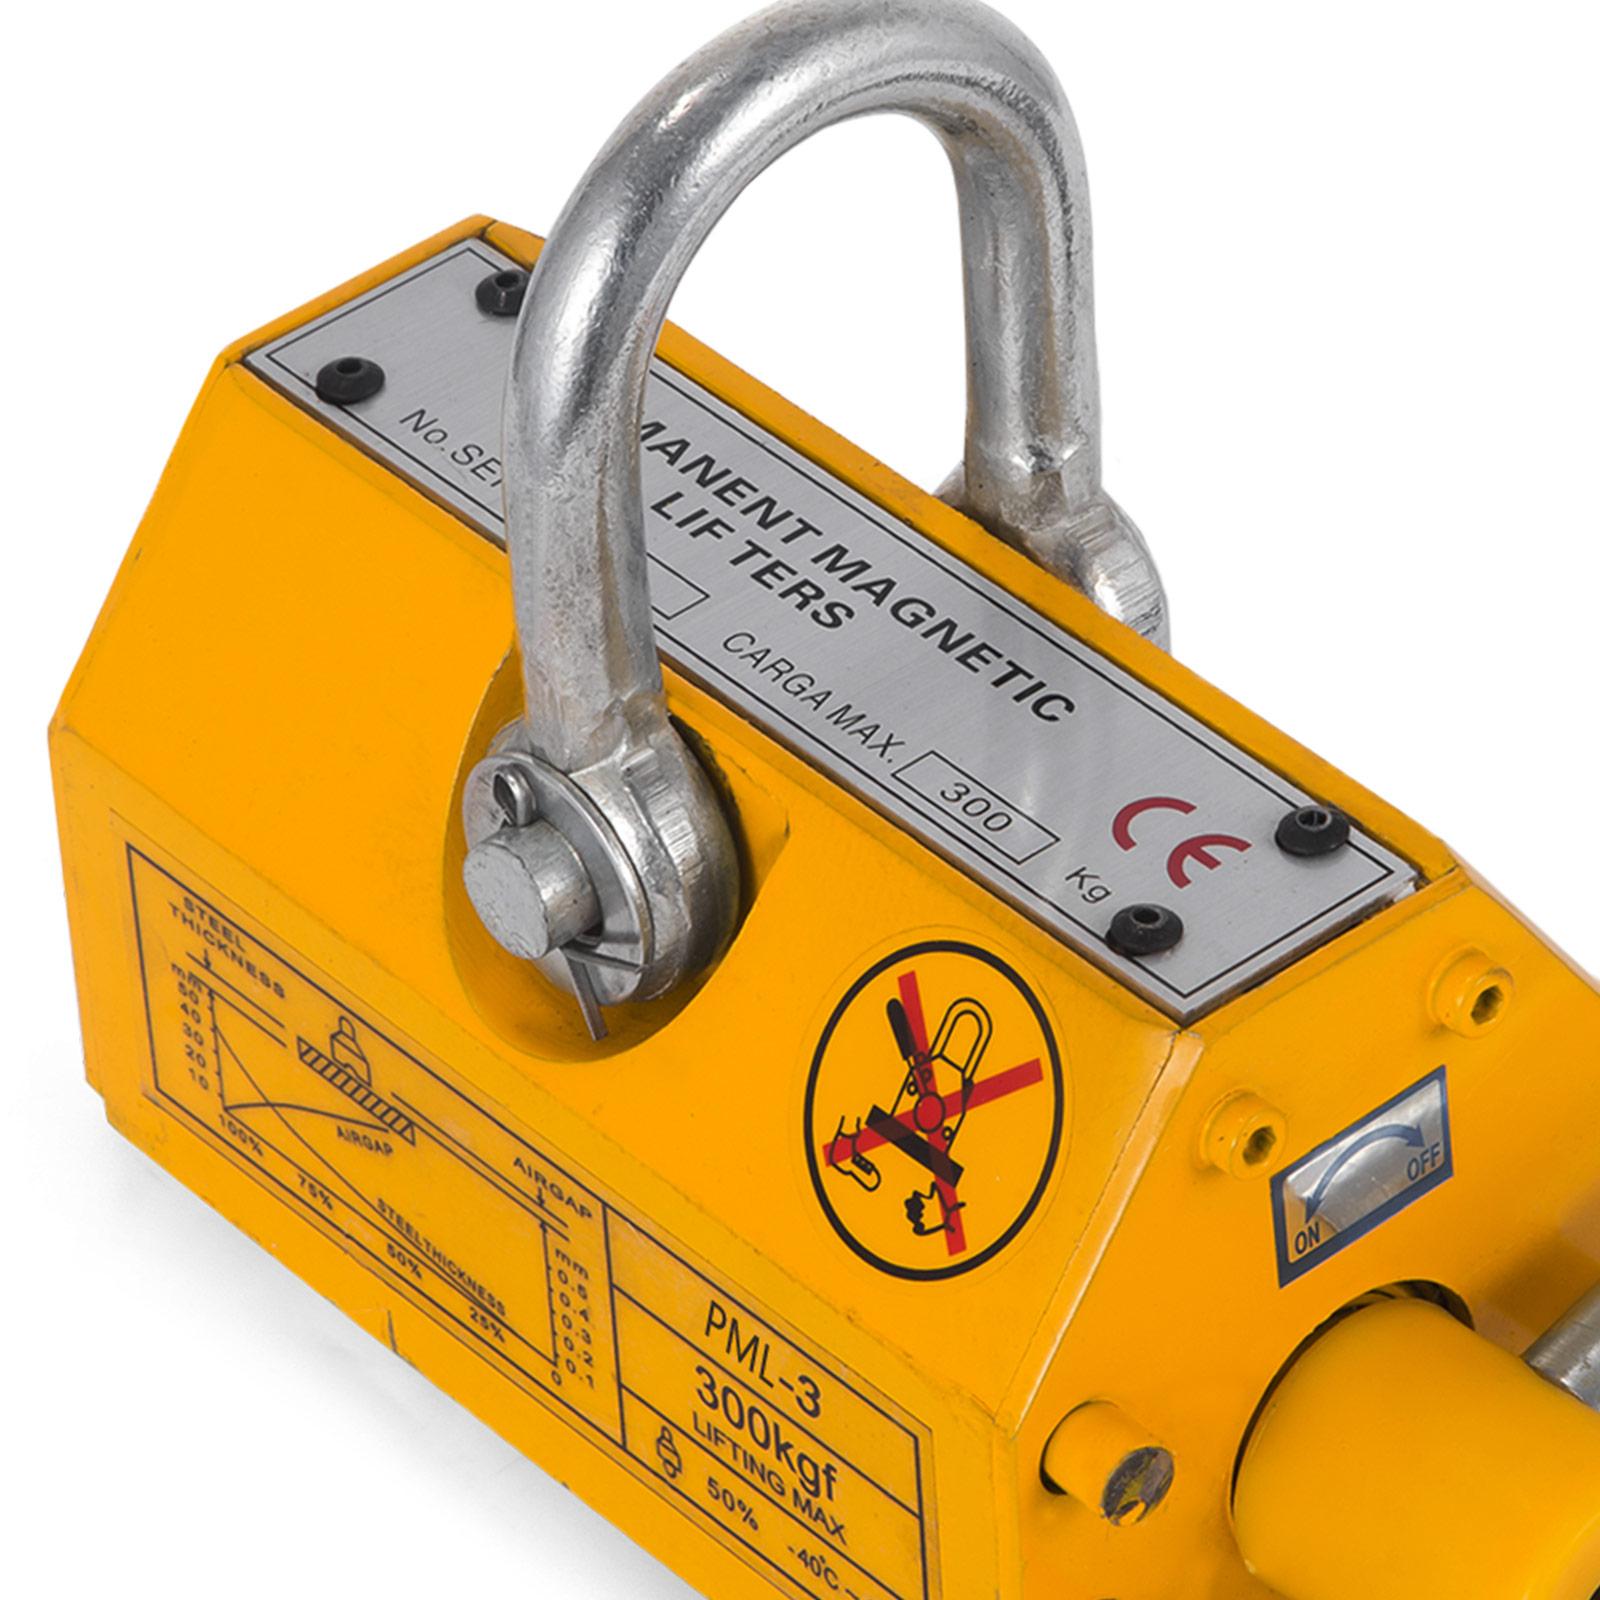 100-300-600-1000KG-Steel-Magnetic-Lifter-Heavy-Duty-Crane-Hoist-Lifting-Magnet miniature 32